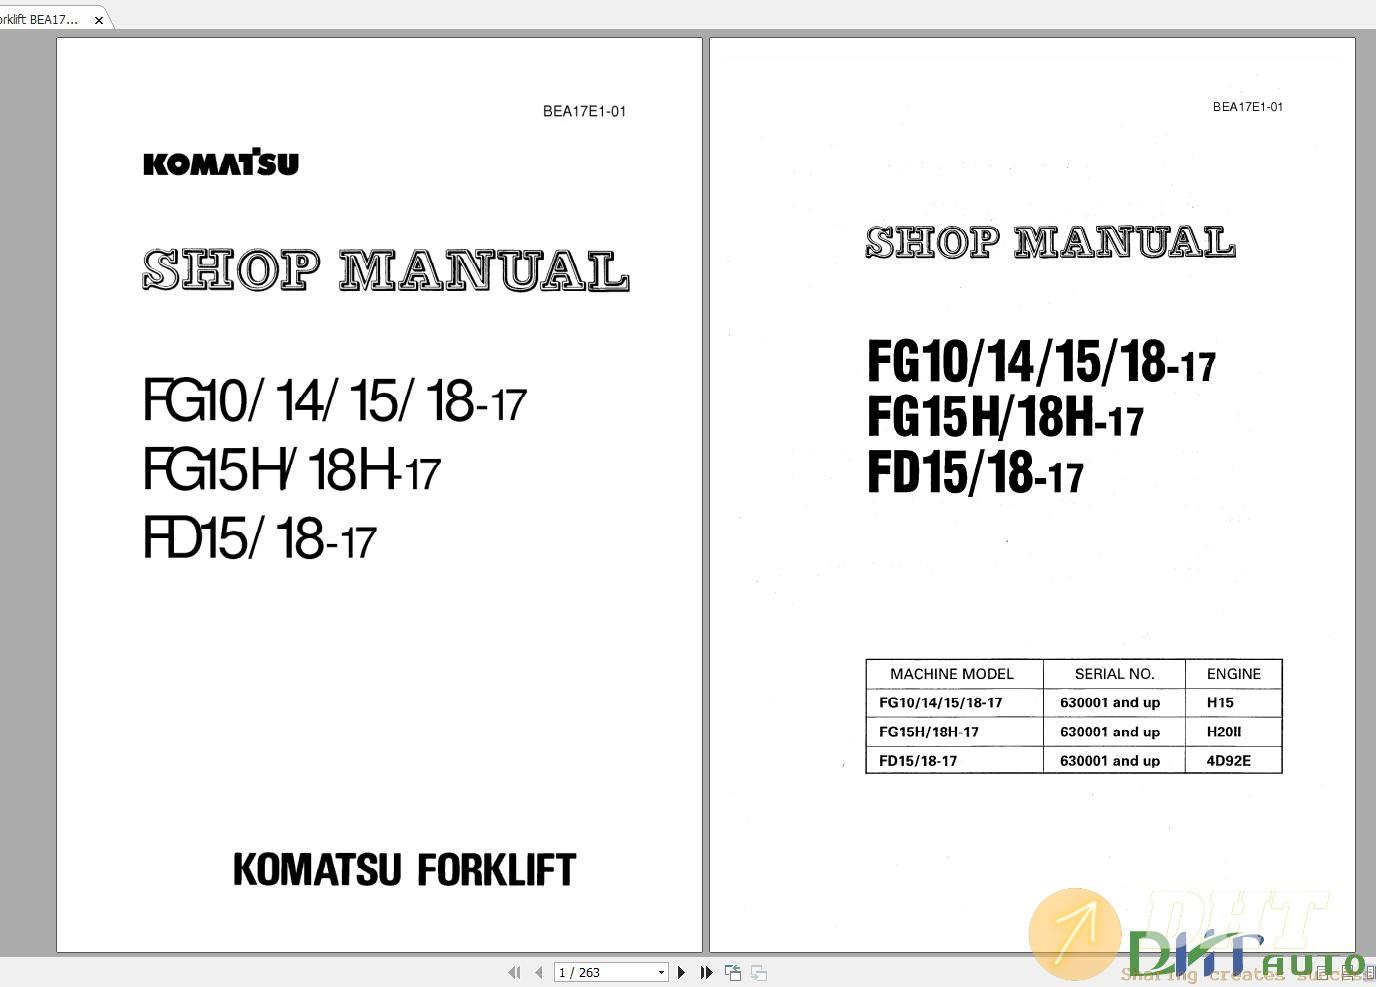 Komatsu-Forklift-Shop-Manual-PDF-Full-4.jpg